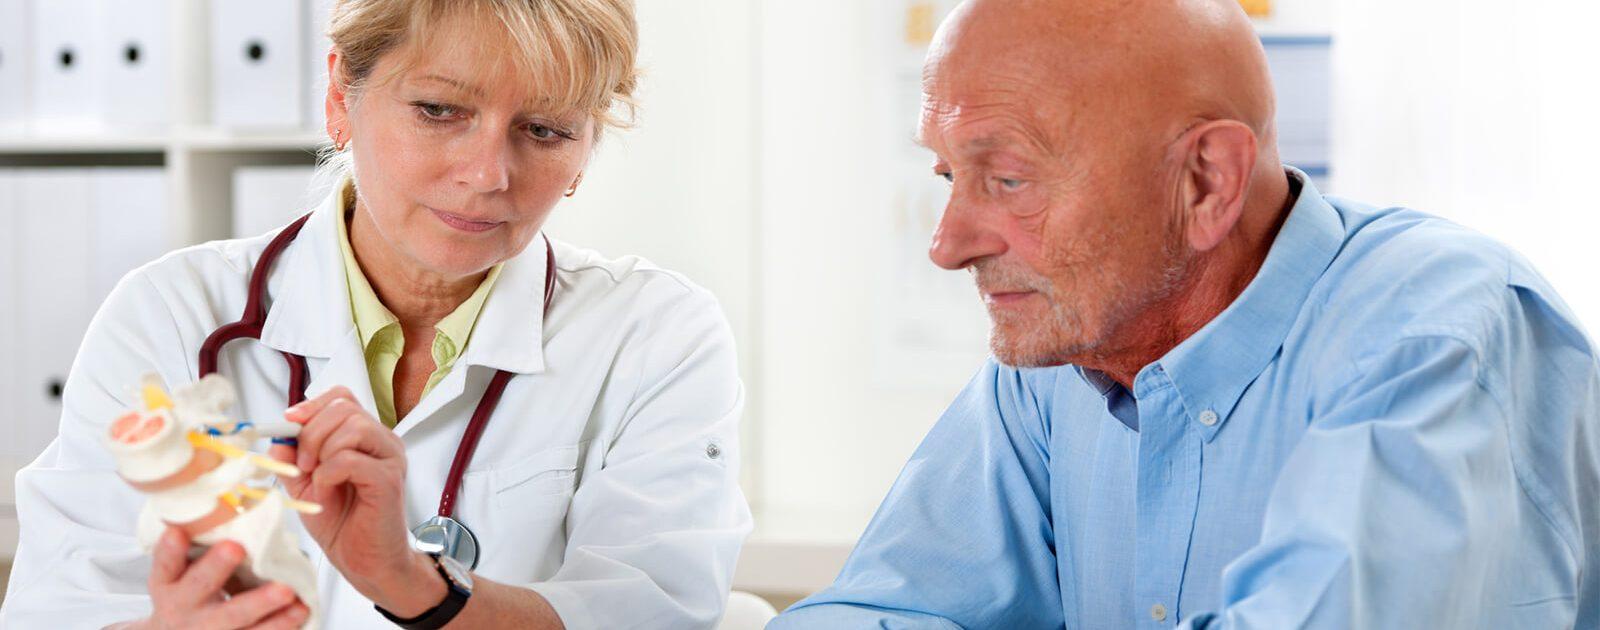 Eine Ärztin berät den Patienten wegen seinen Rückenschmerzen